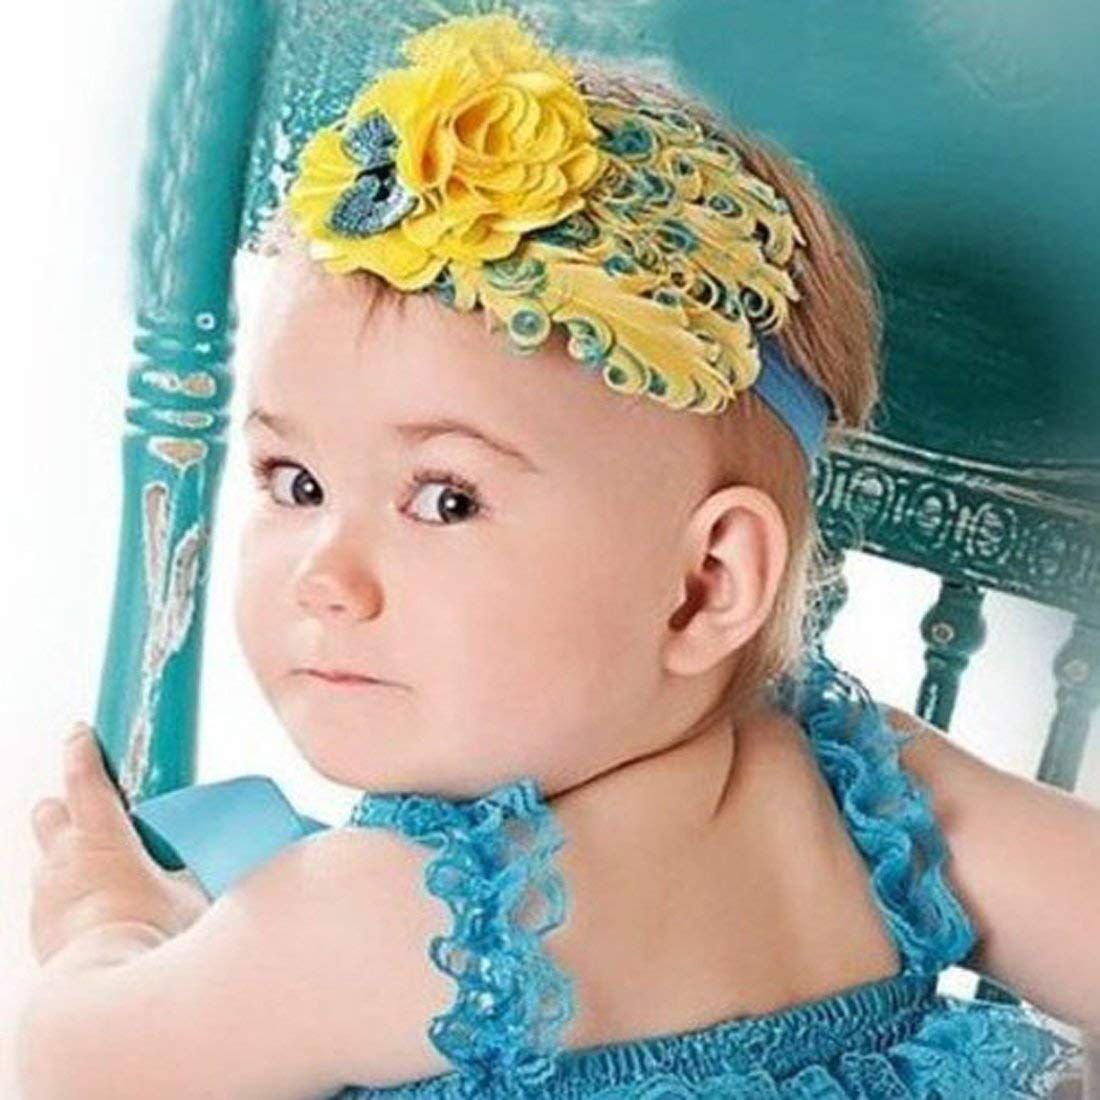 Nicedeal Lovely Unusal Cotton Girls Baby Yellow Feather Hairband Yellow Big Flower HeadbandFor Hair Beauty and Hair deco